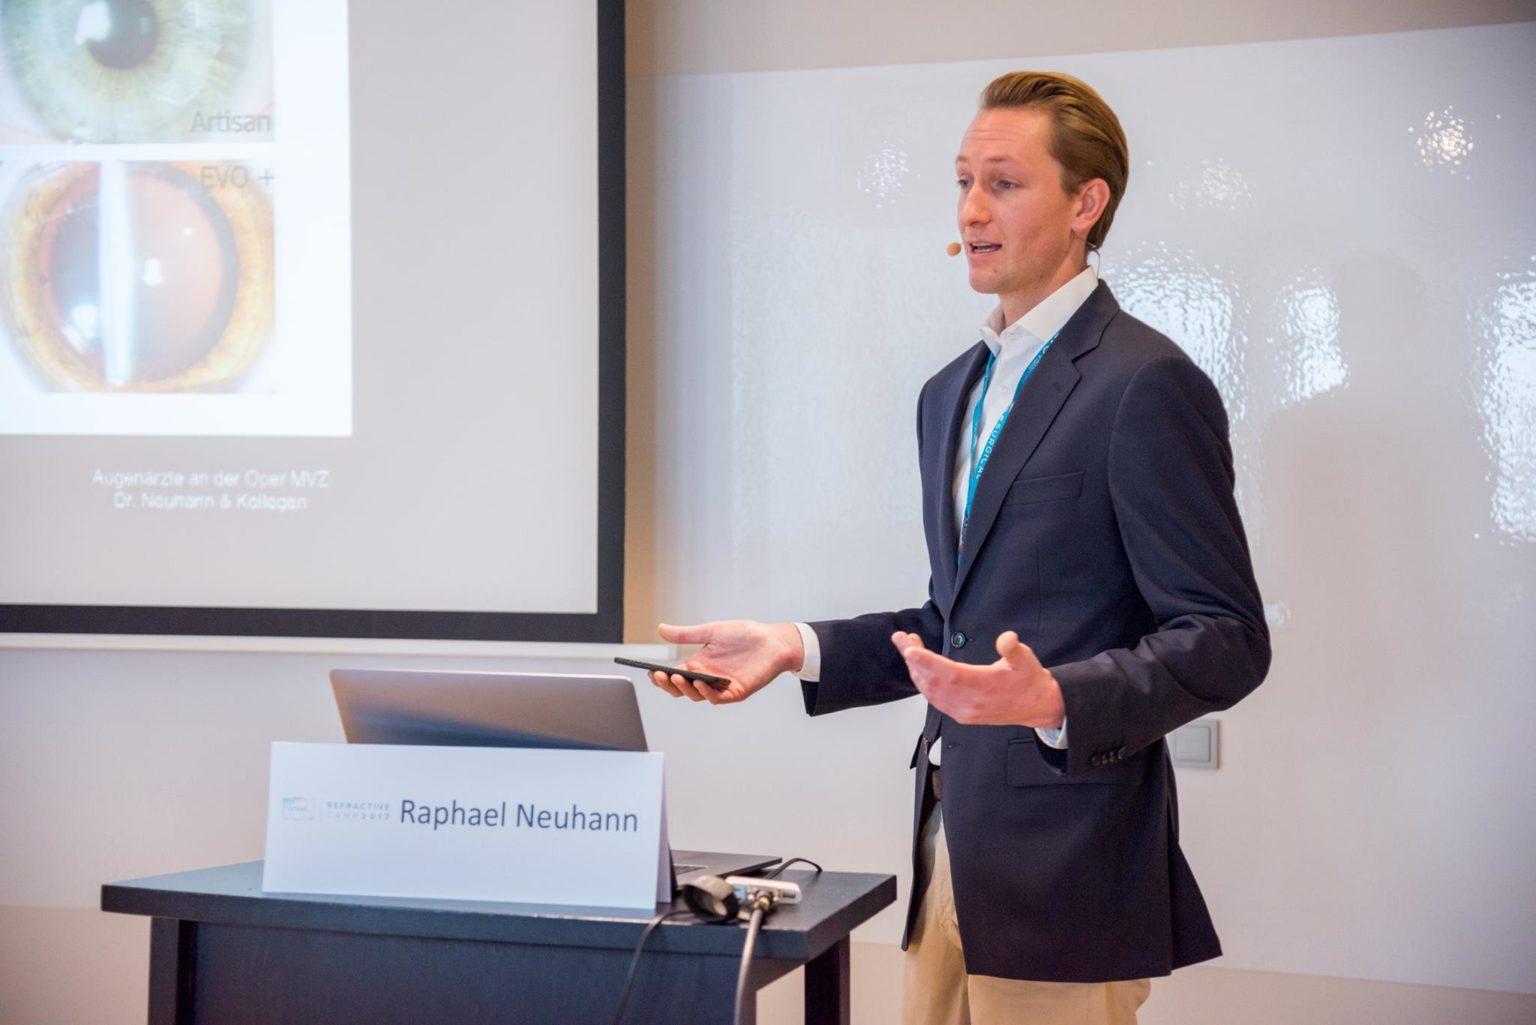 Dr. Raphael Neuhann